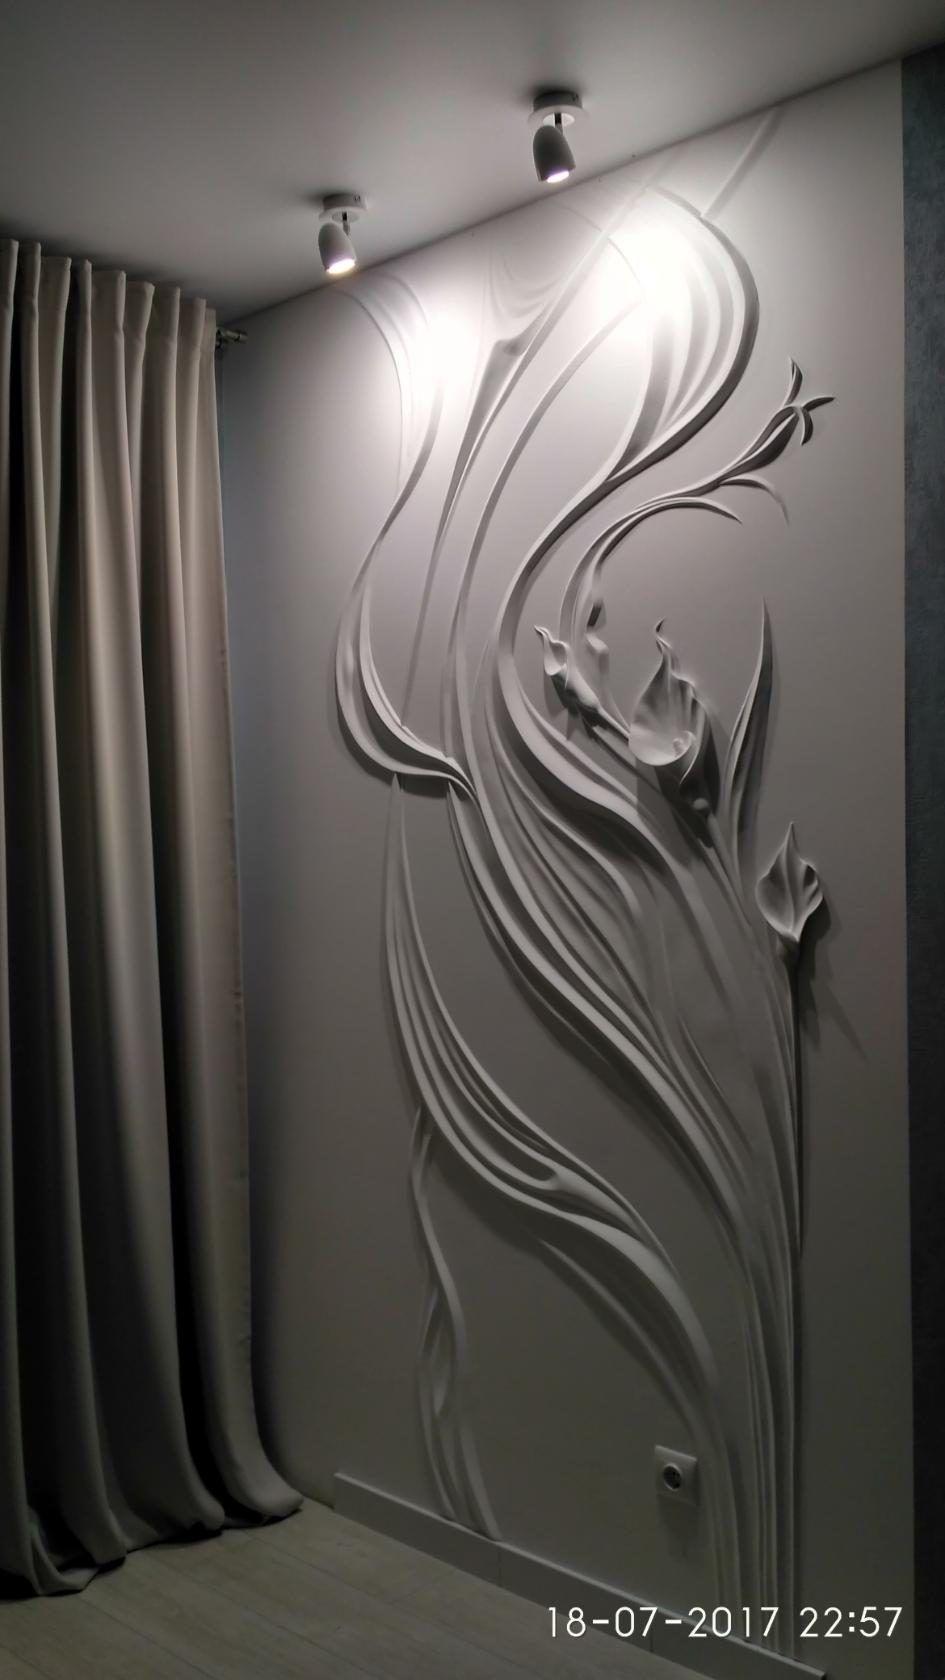 Photos | decoración de paredes | Pinterest | Yeso, Textura y Cuadro